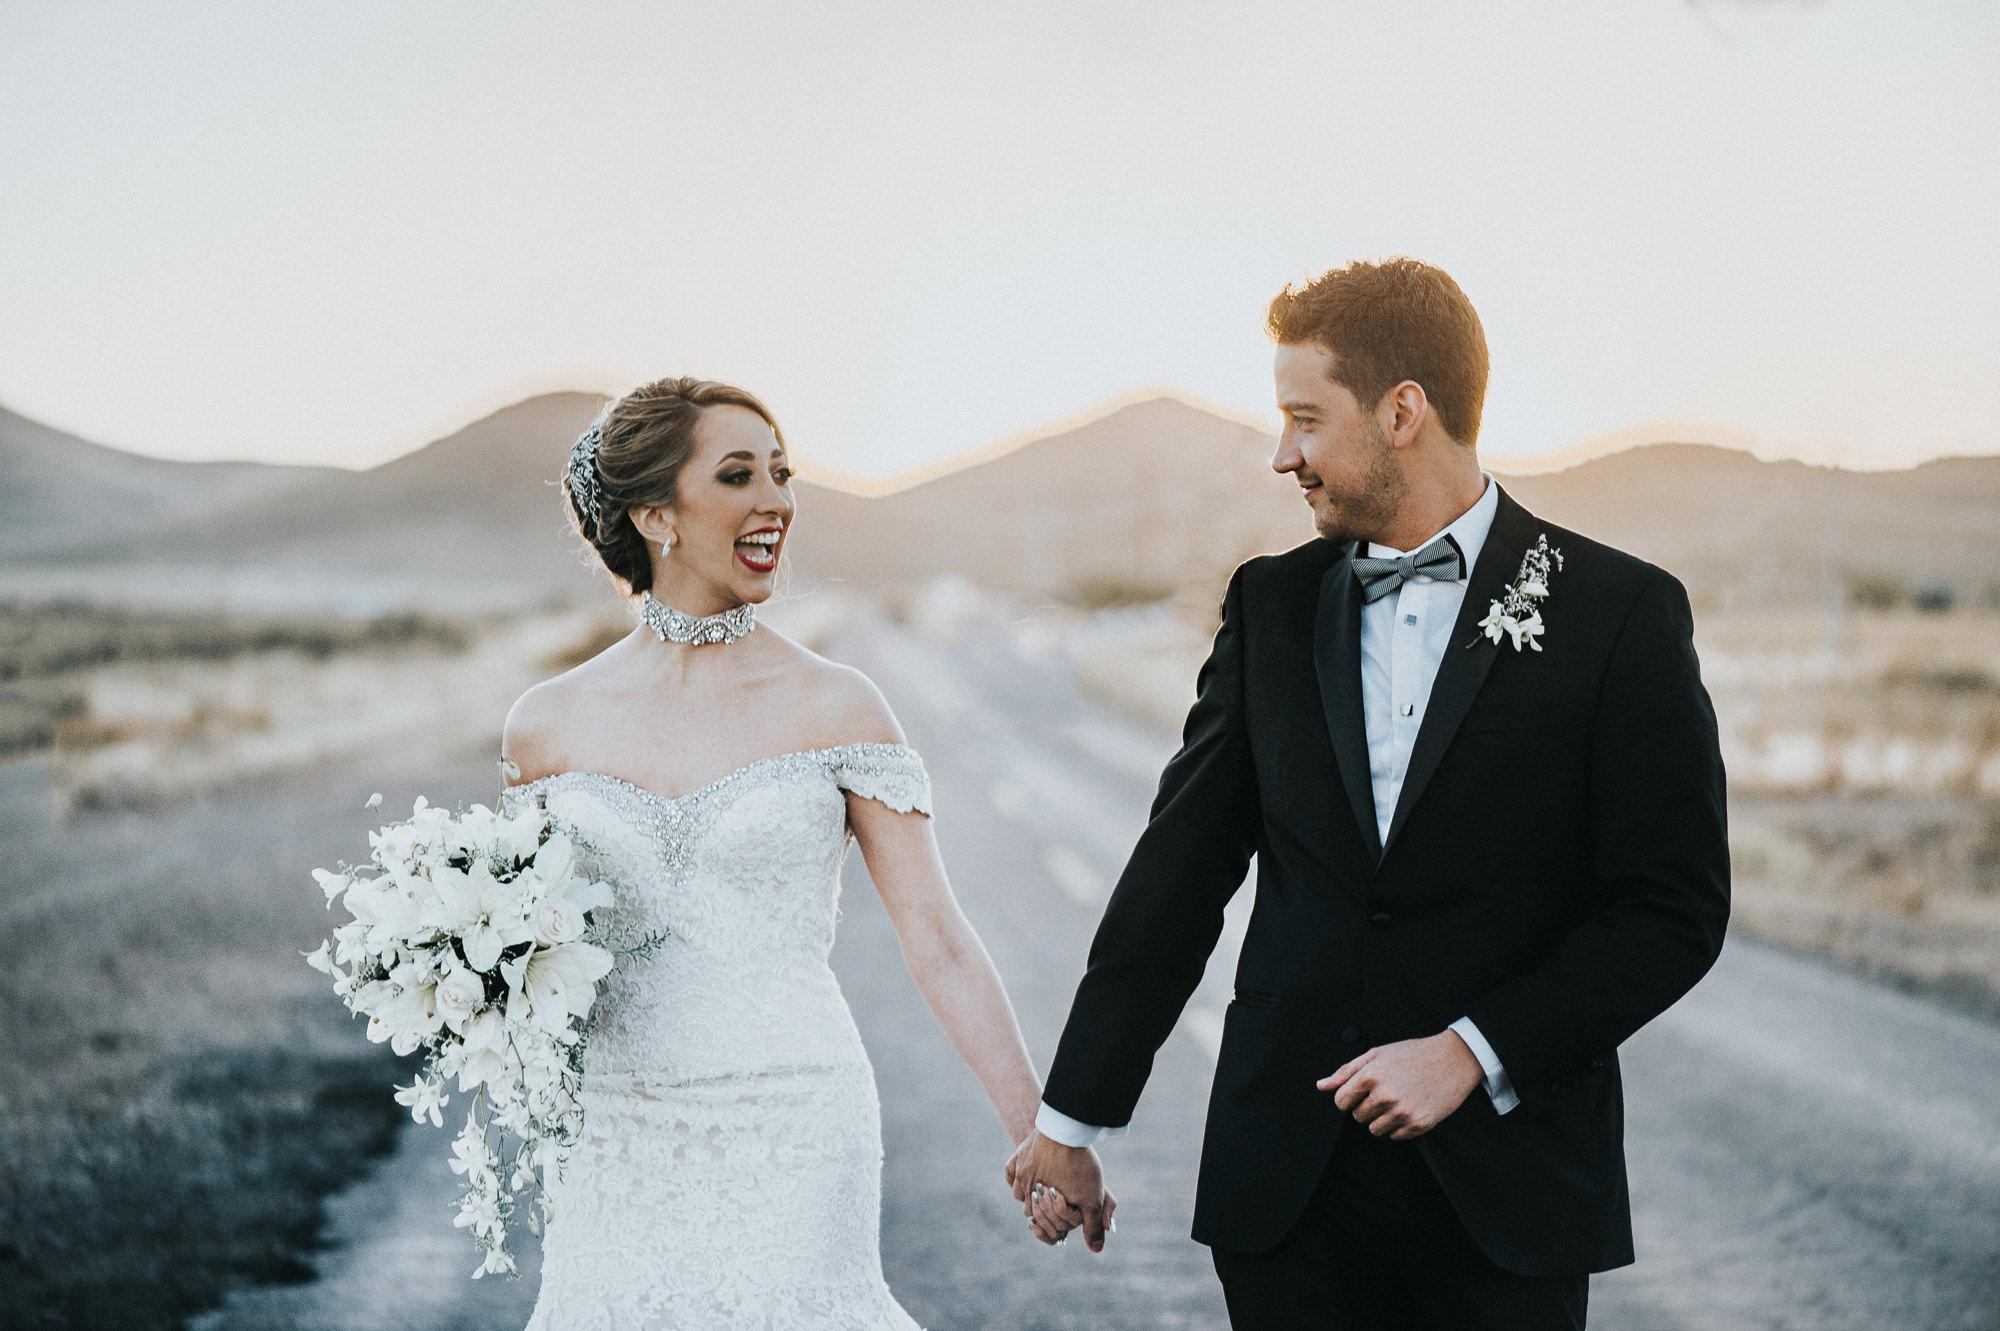 Mario-Karla-Wedding-140